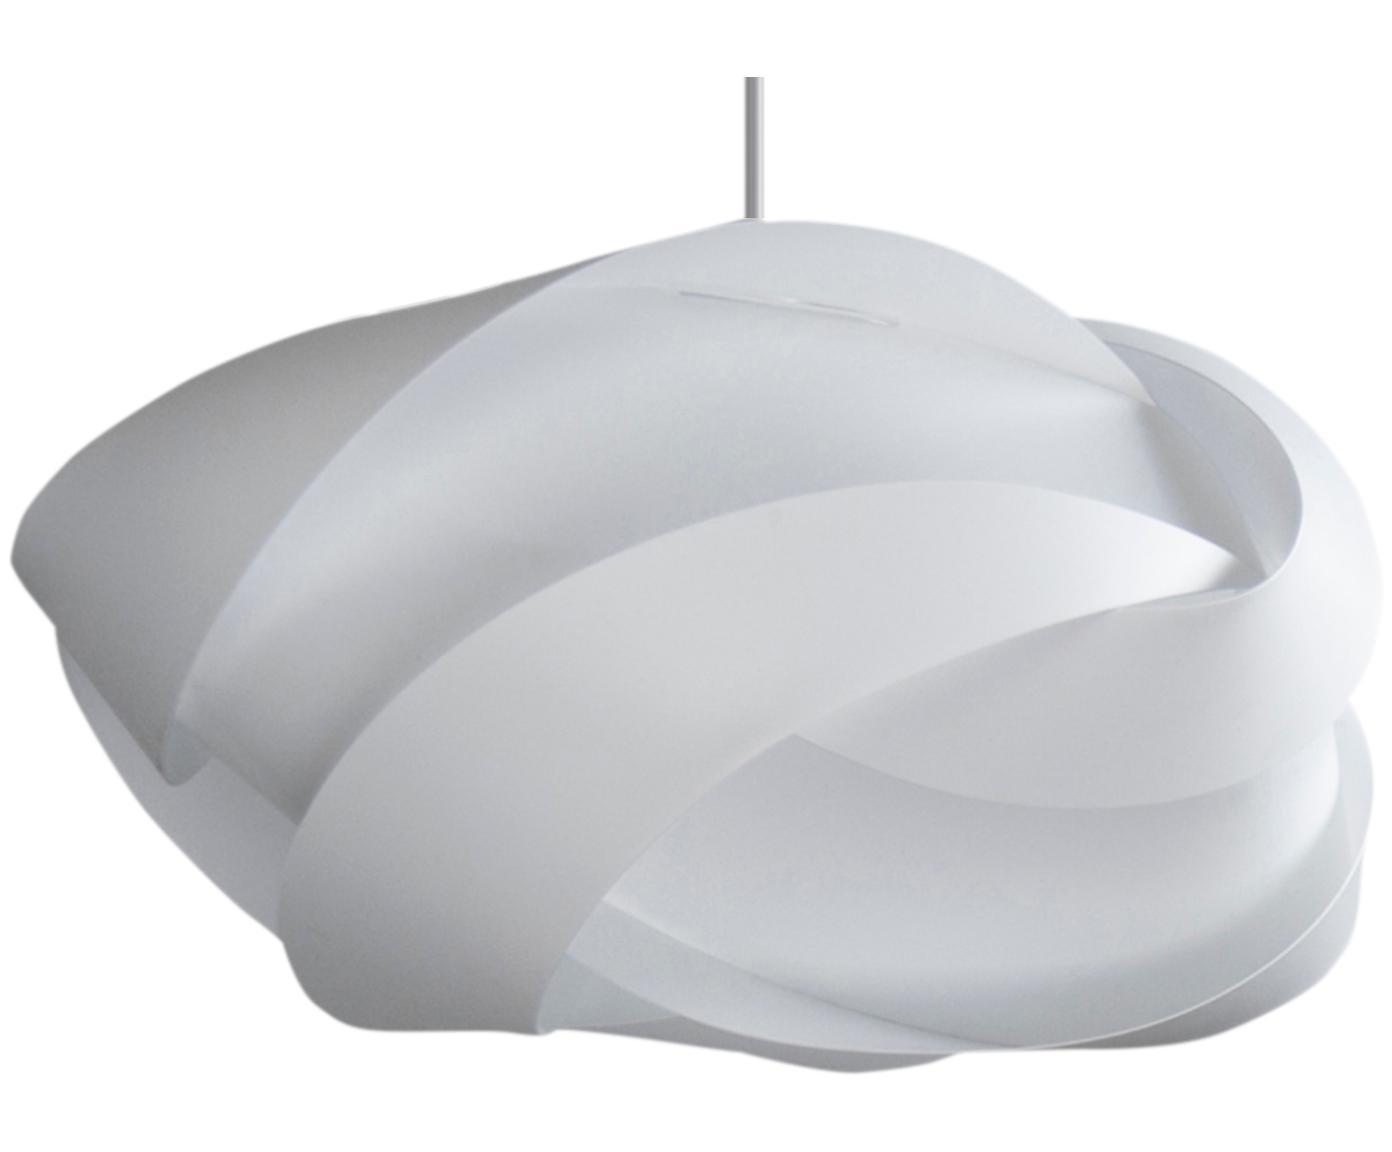 Pendelleuchte Ribbon, Bausatz, Lampenschirm: Polypropylen, Polycarbona, Baldachin: Kunststoff, Weiss, Ø 33 x H 19 cm